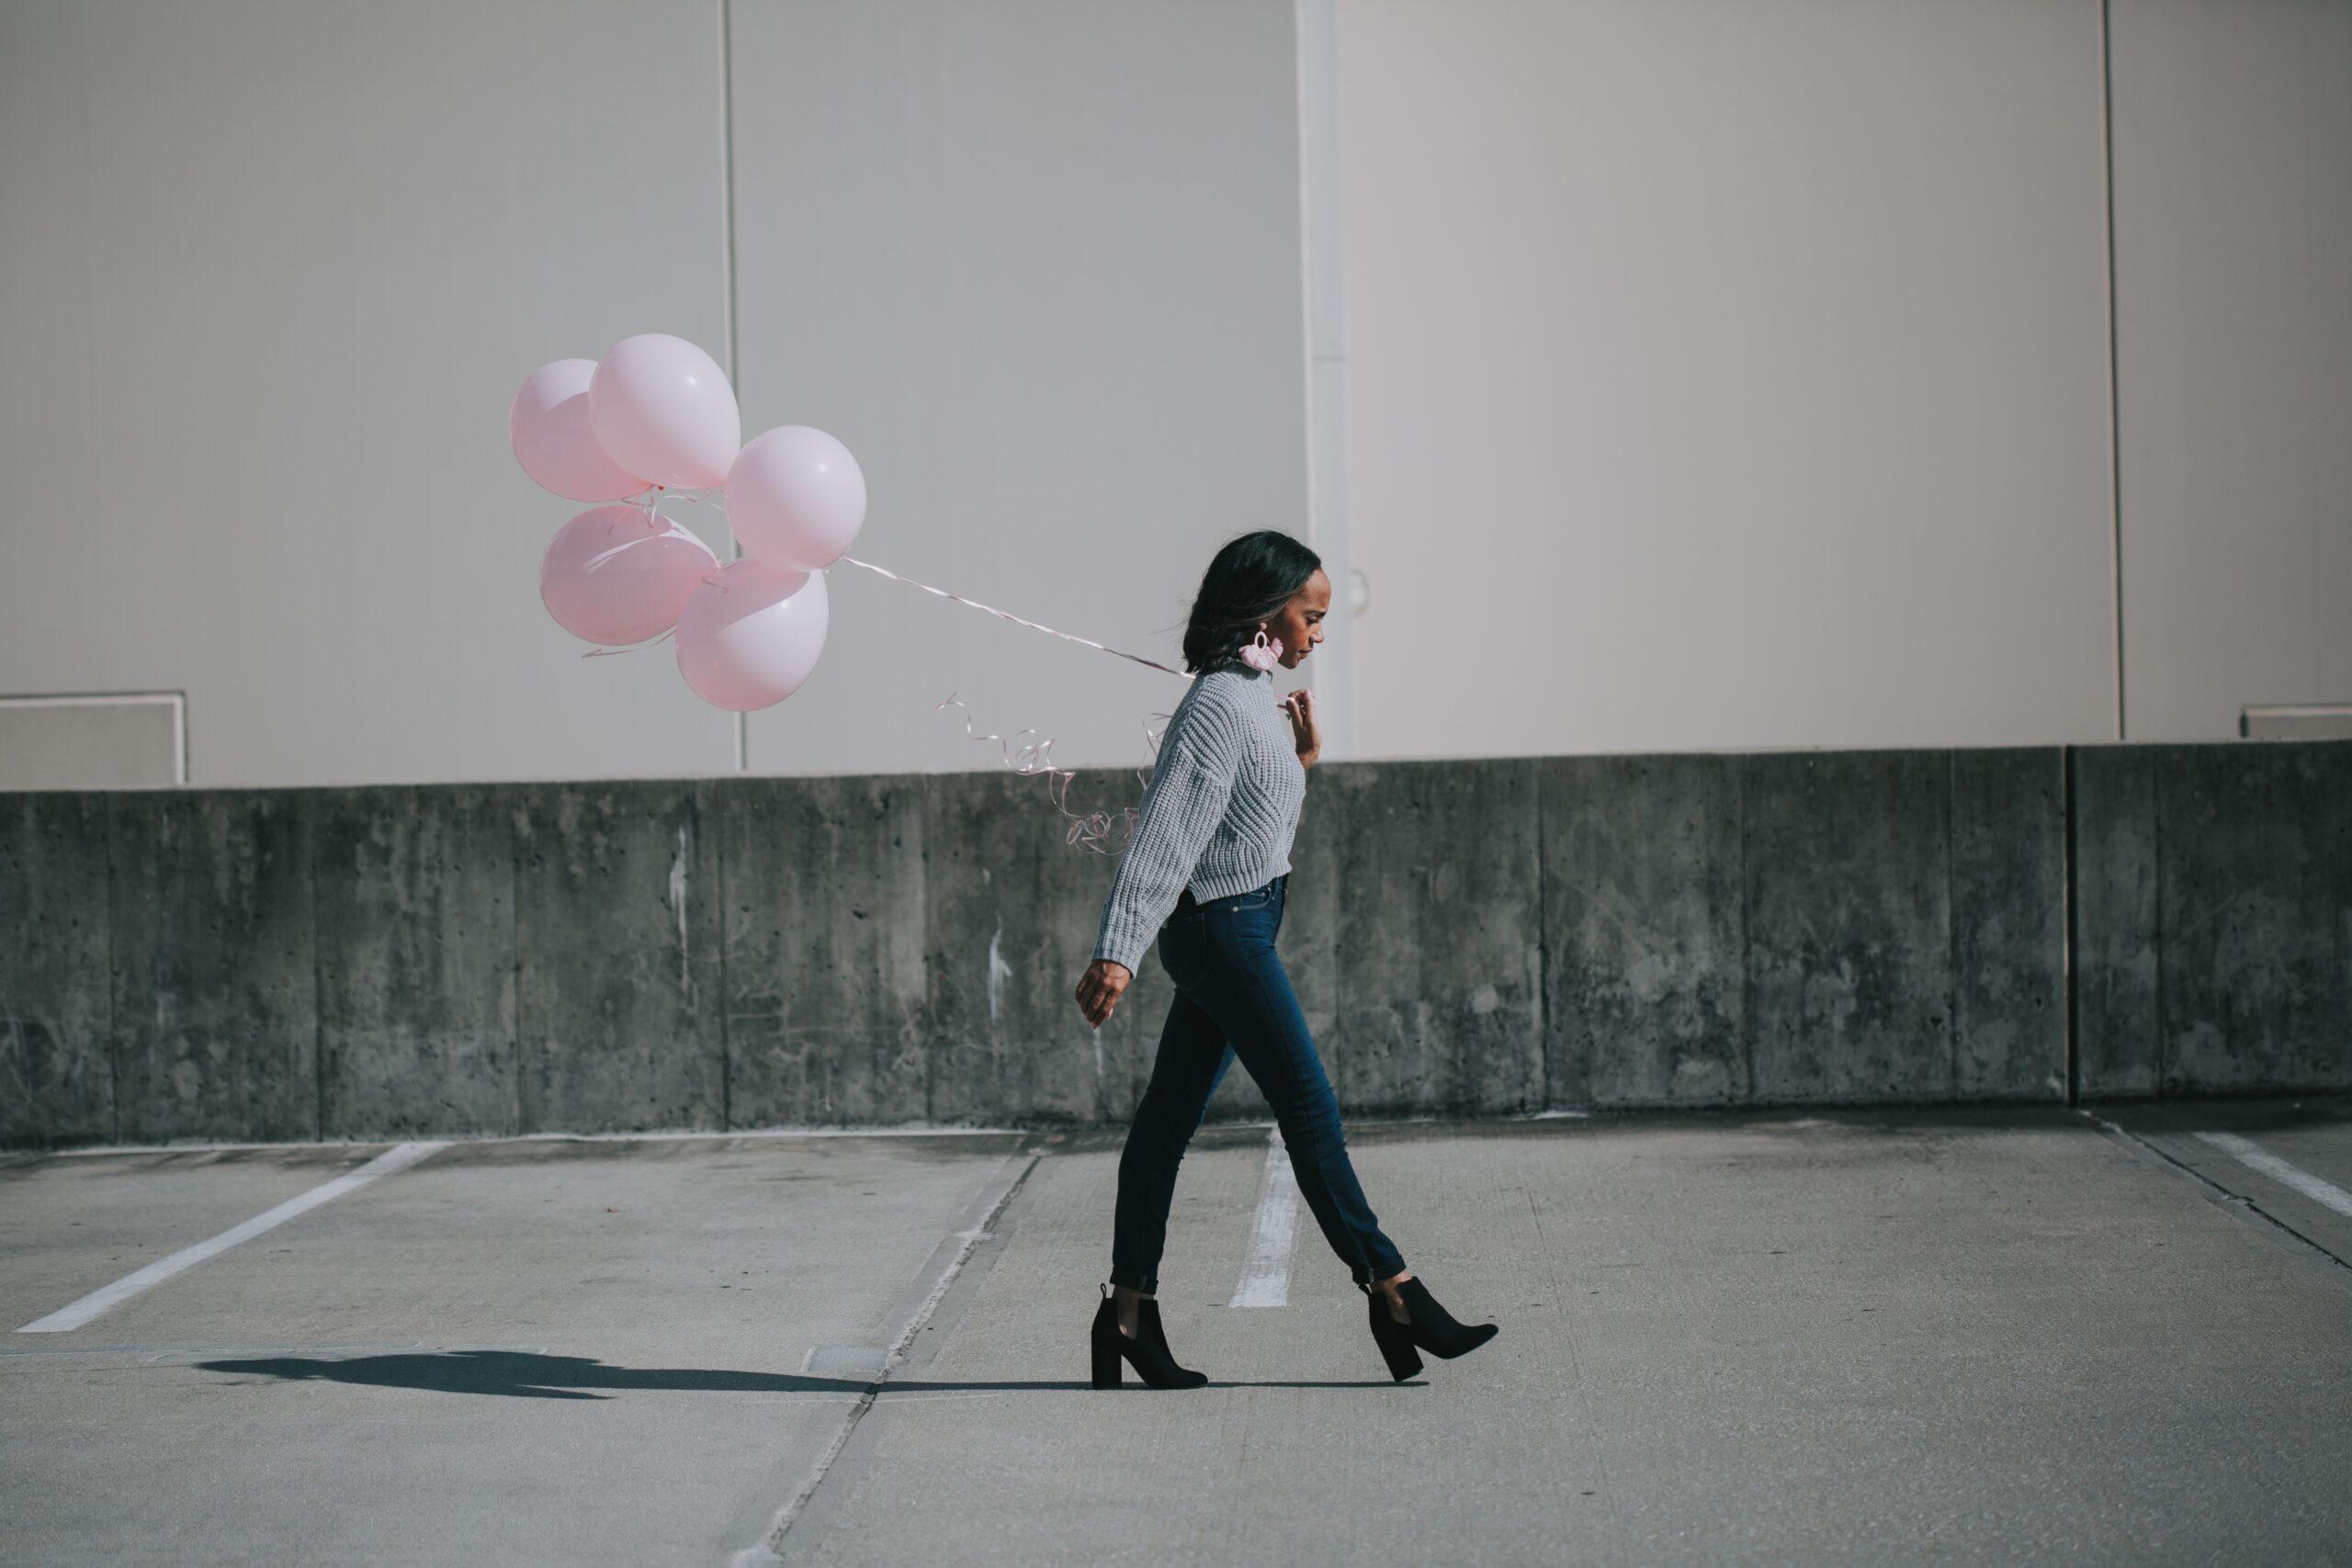 Happy 1 Month Blogiversary